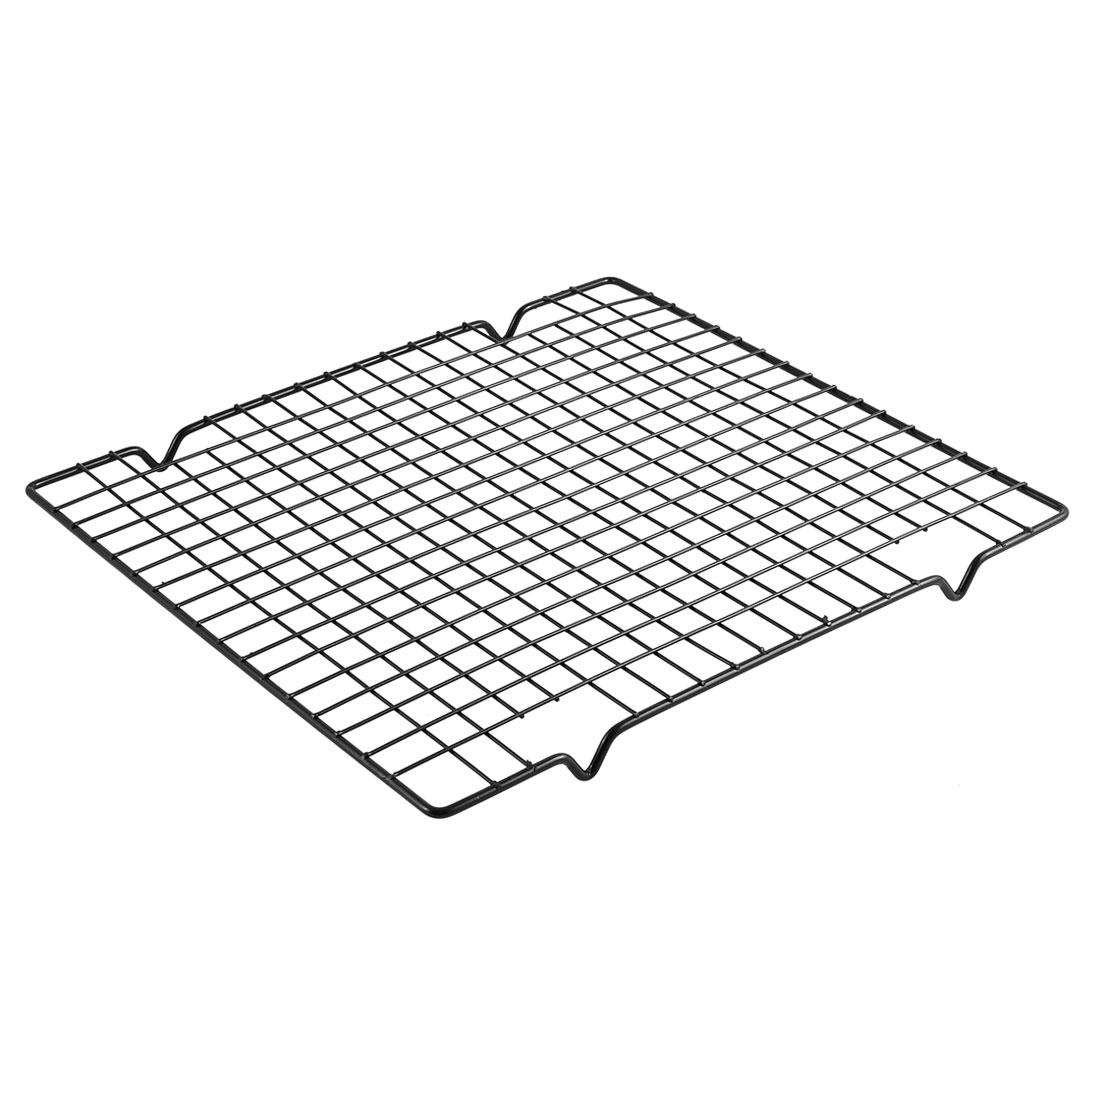 Kitchen Metal Rectangle Bread Cake Baking Cooling Rack Black 28 x 25.5 x 1.5cm